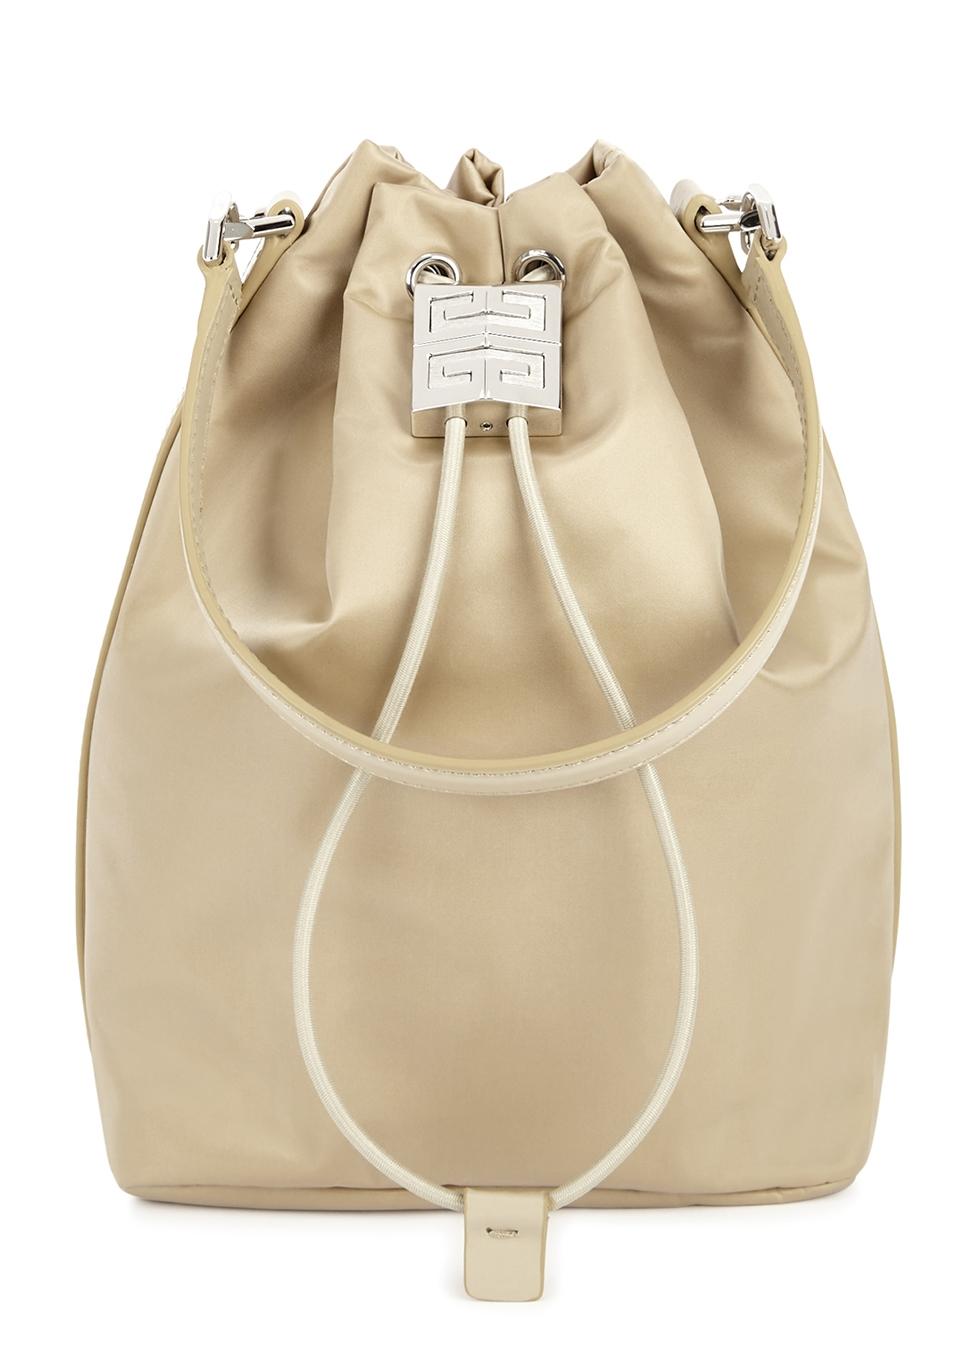 4G Light sand shell bucket bag